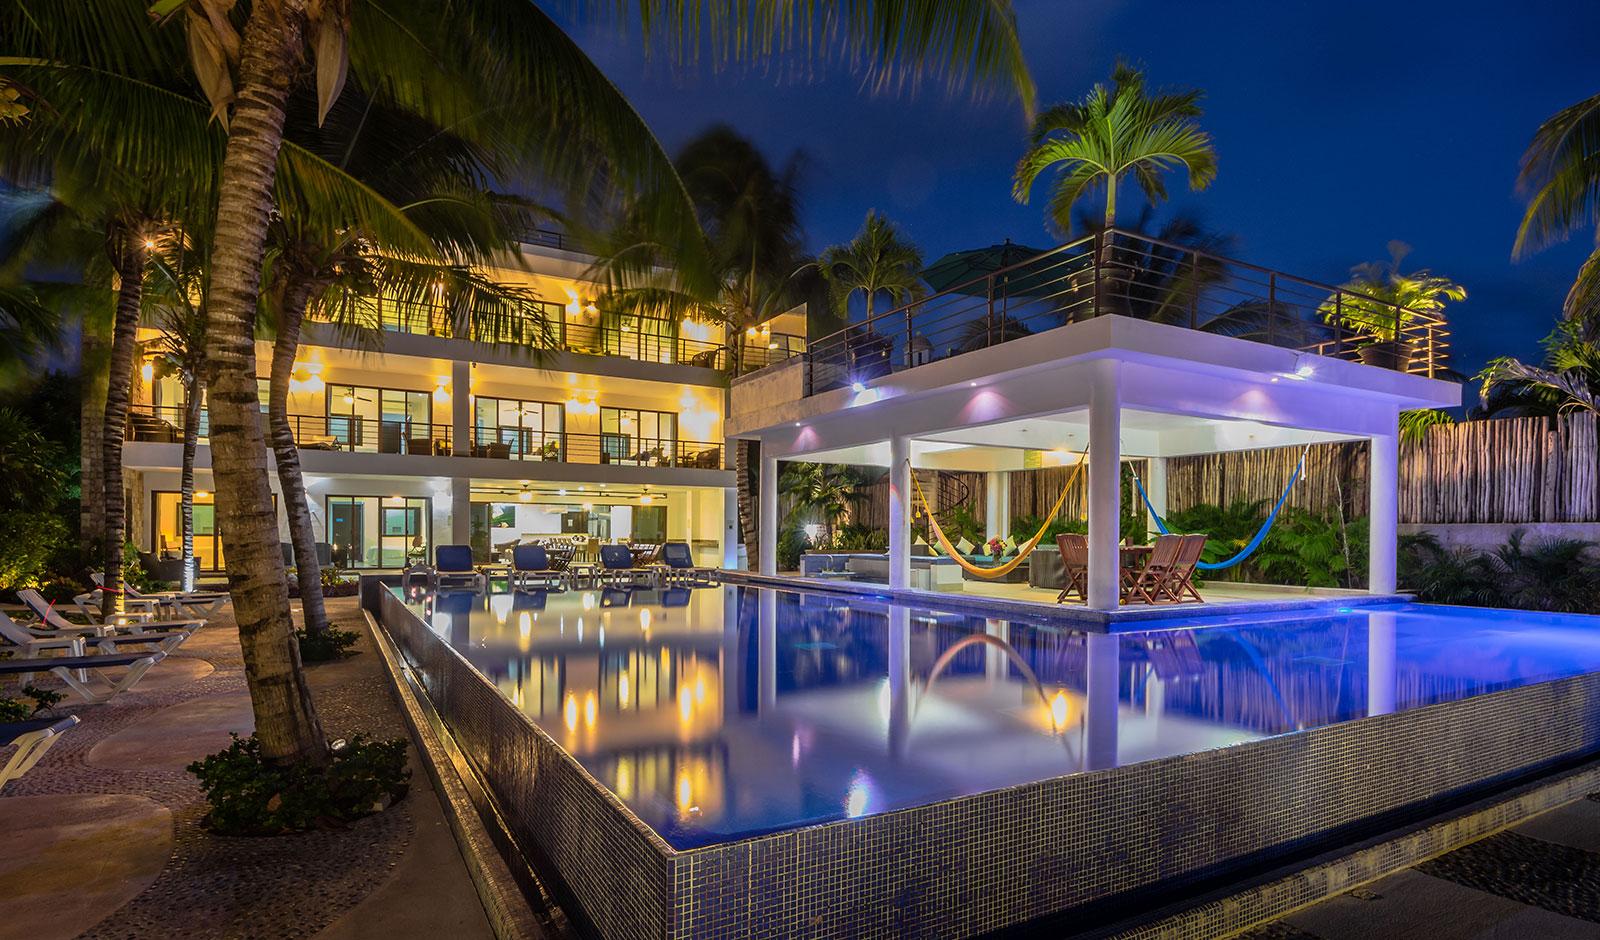 Visit Riviera Maya, Mexico: Tulum, Xpu-Ha & more!